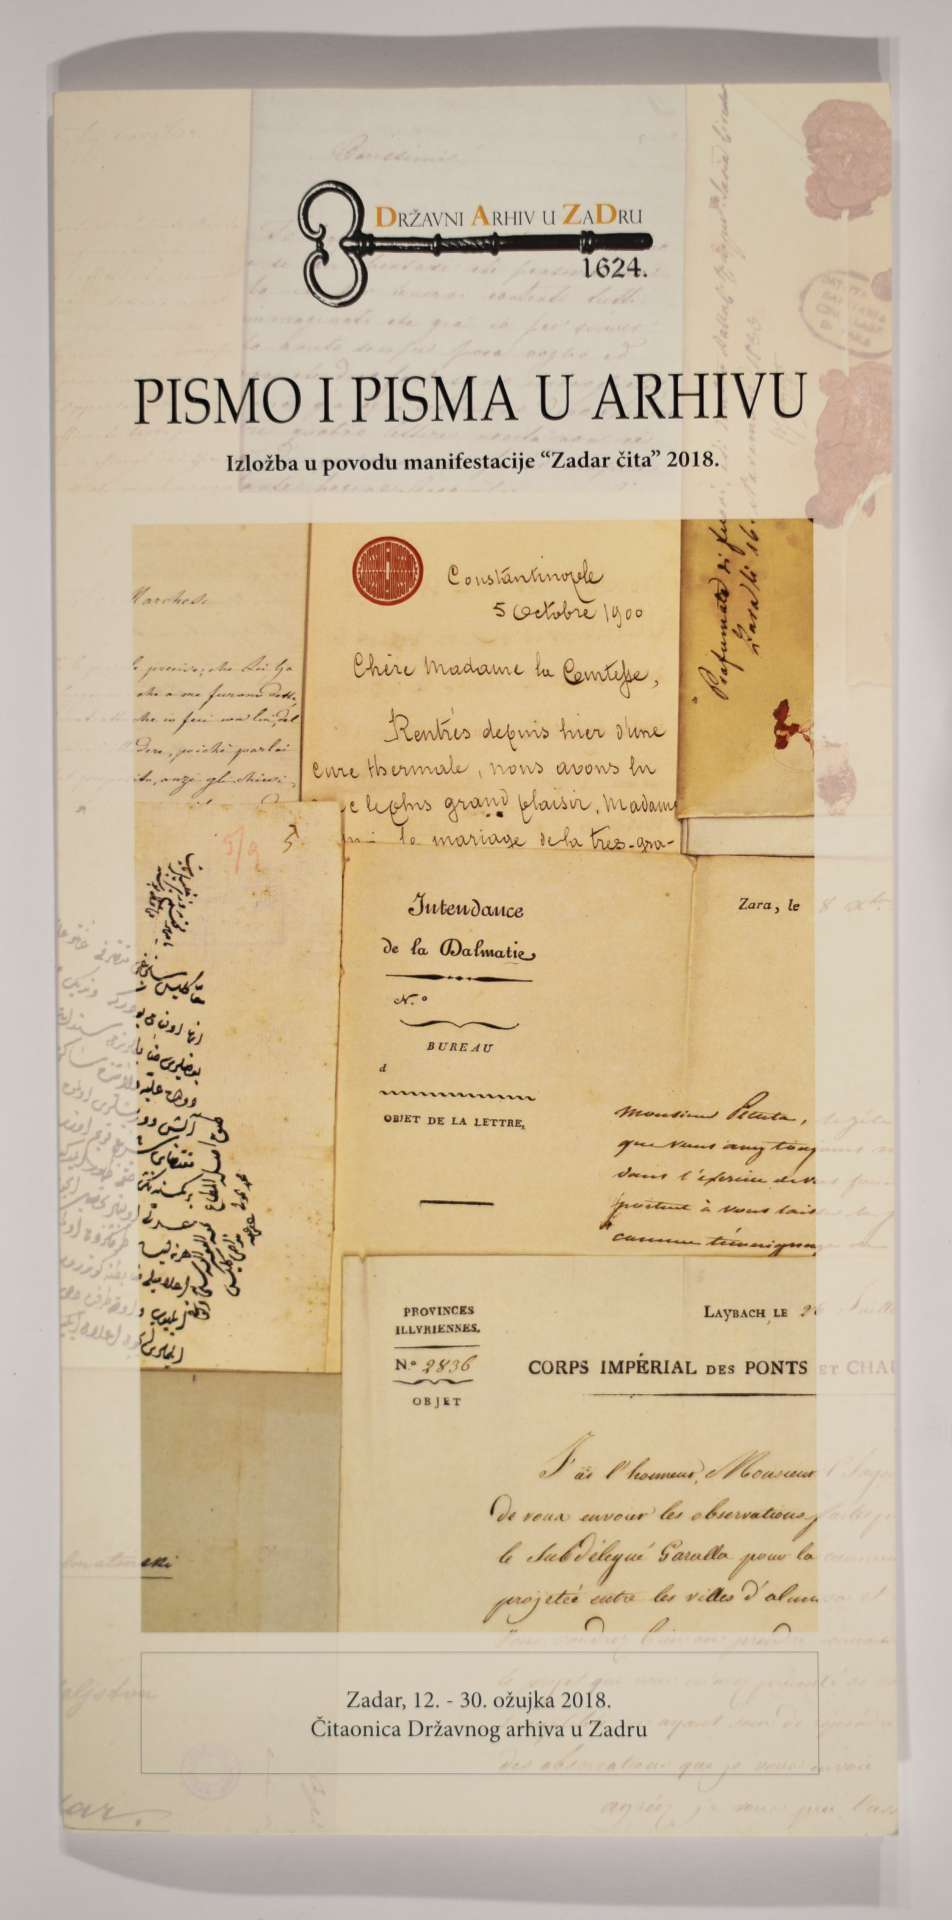 Pismo i pisma u Arhivu